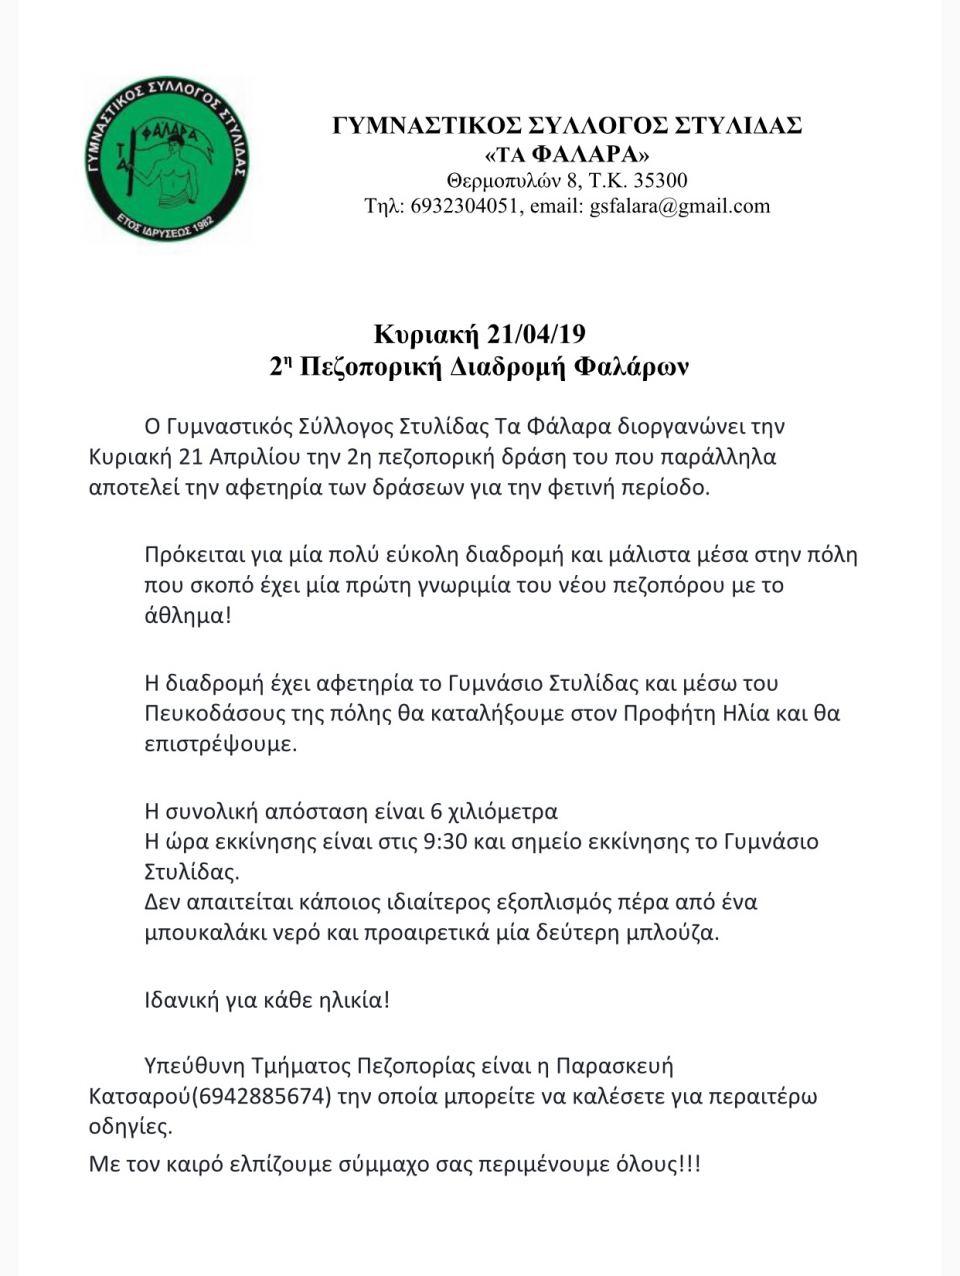 img 7763 ΤΑ ΦΑΛΑΡΑ ΣΤΥΛΙΔΑ ΠΕΖΟΠΟΡΙΑ